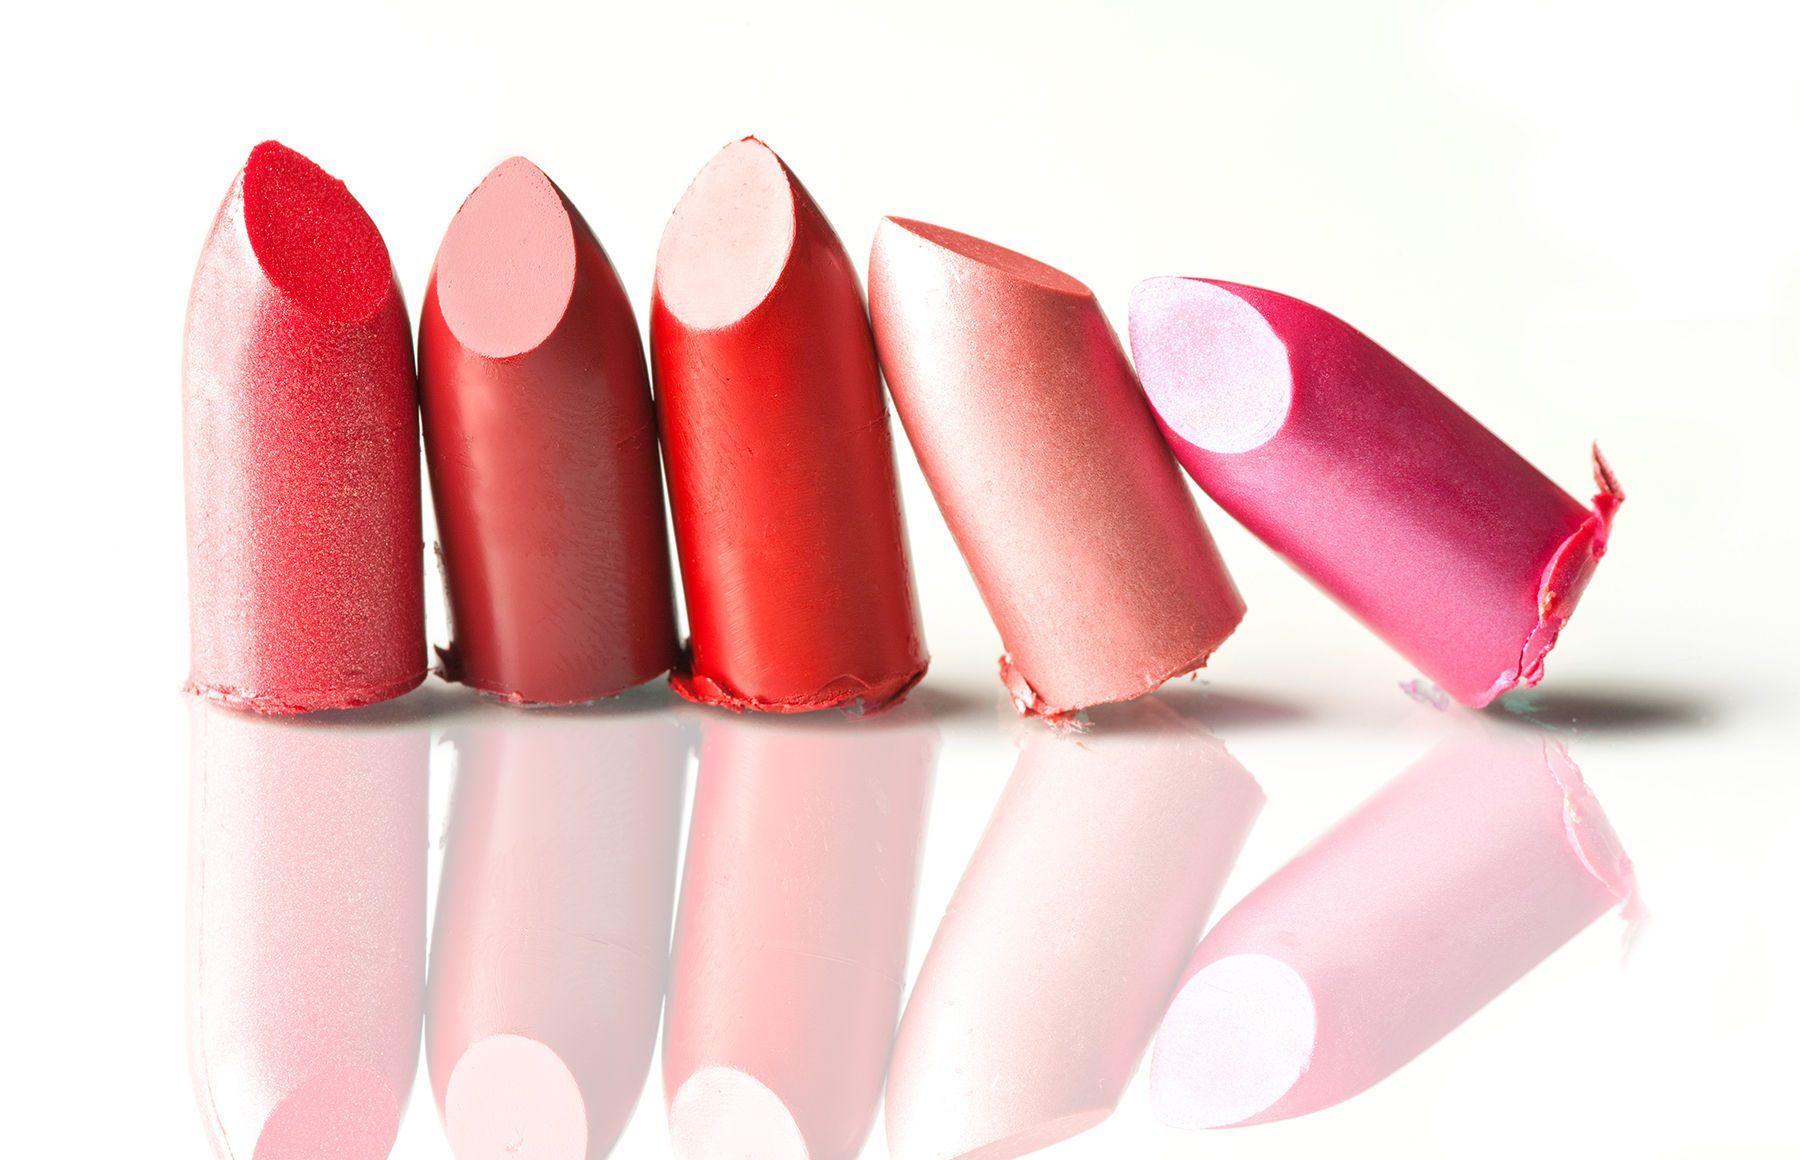 Warna Lipstik Shemagazine Lipstik, Warna, Make up